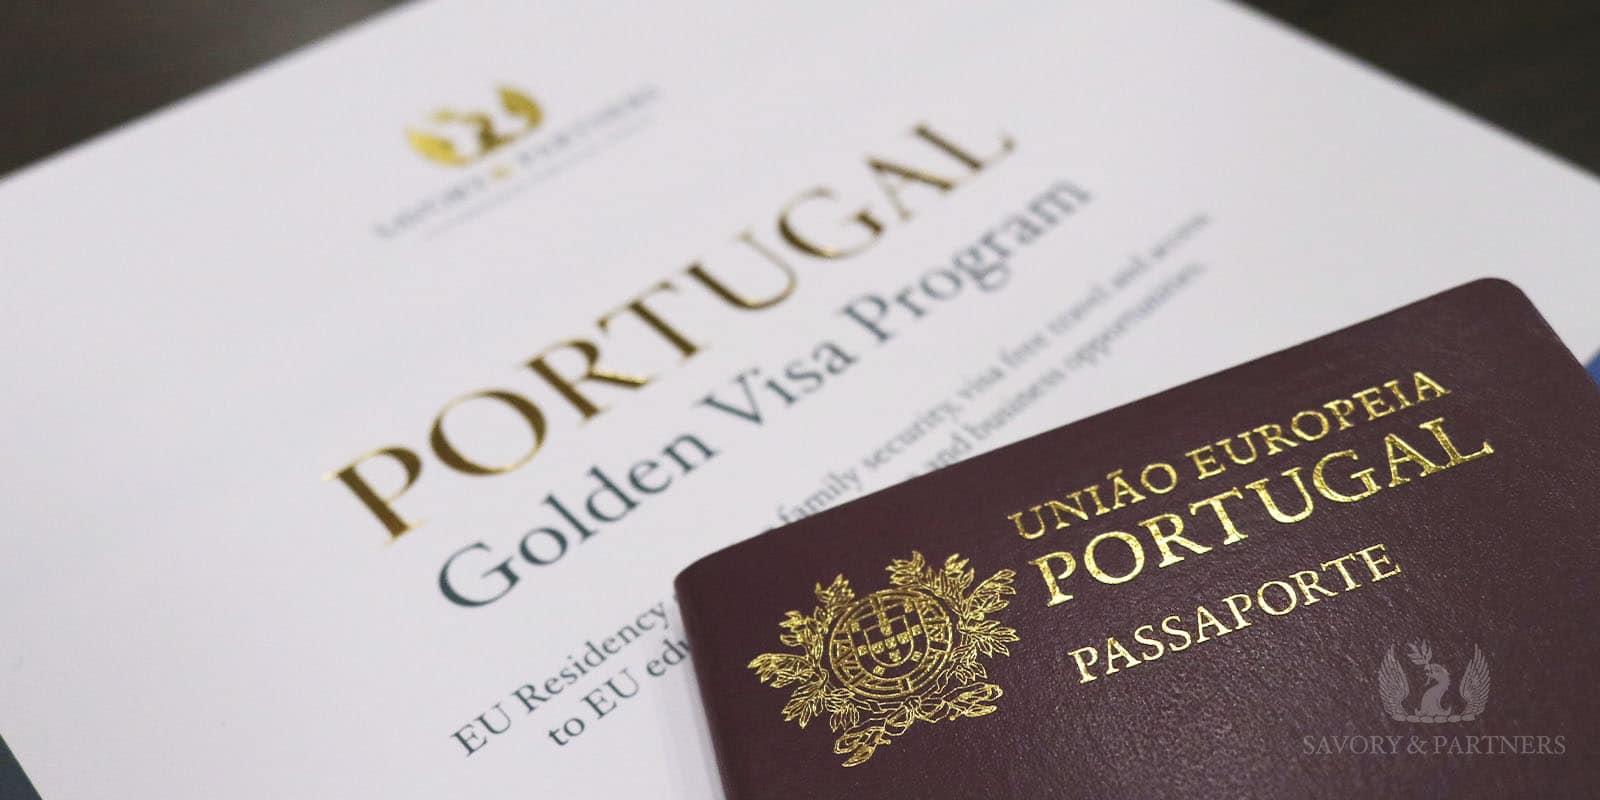 Portuguese passport - Savory & Partners - Dubai, UAE